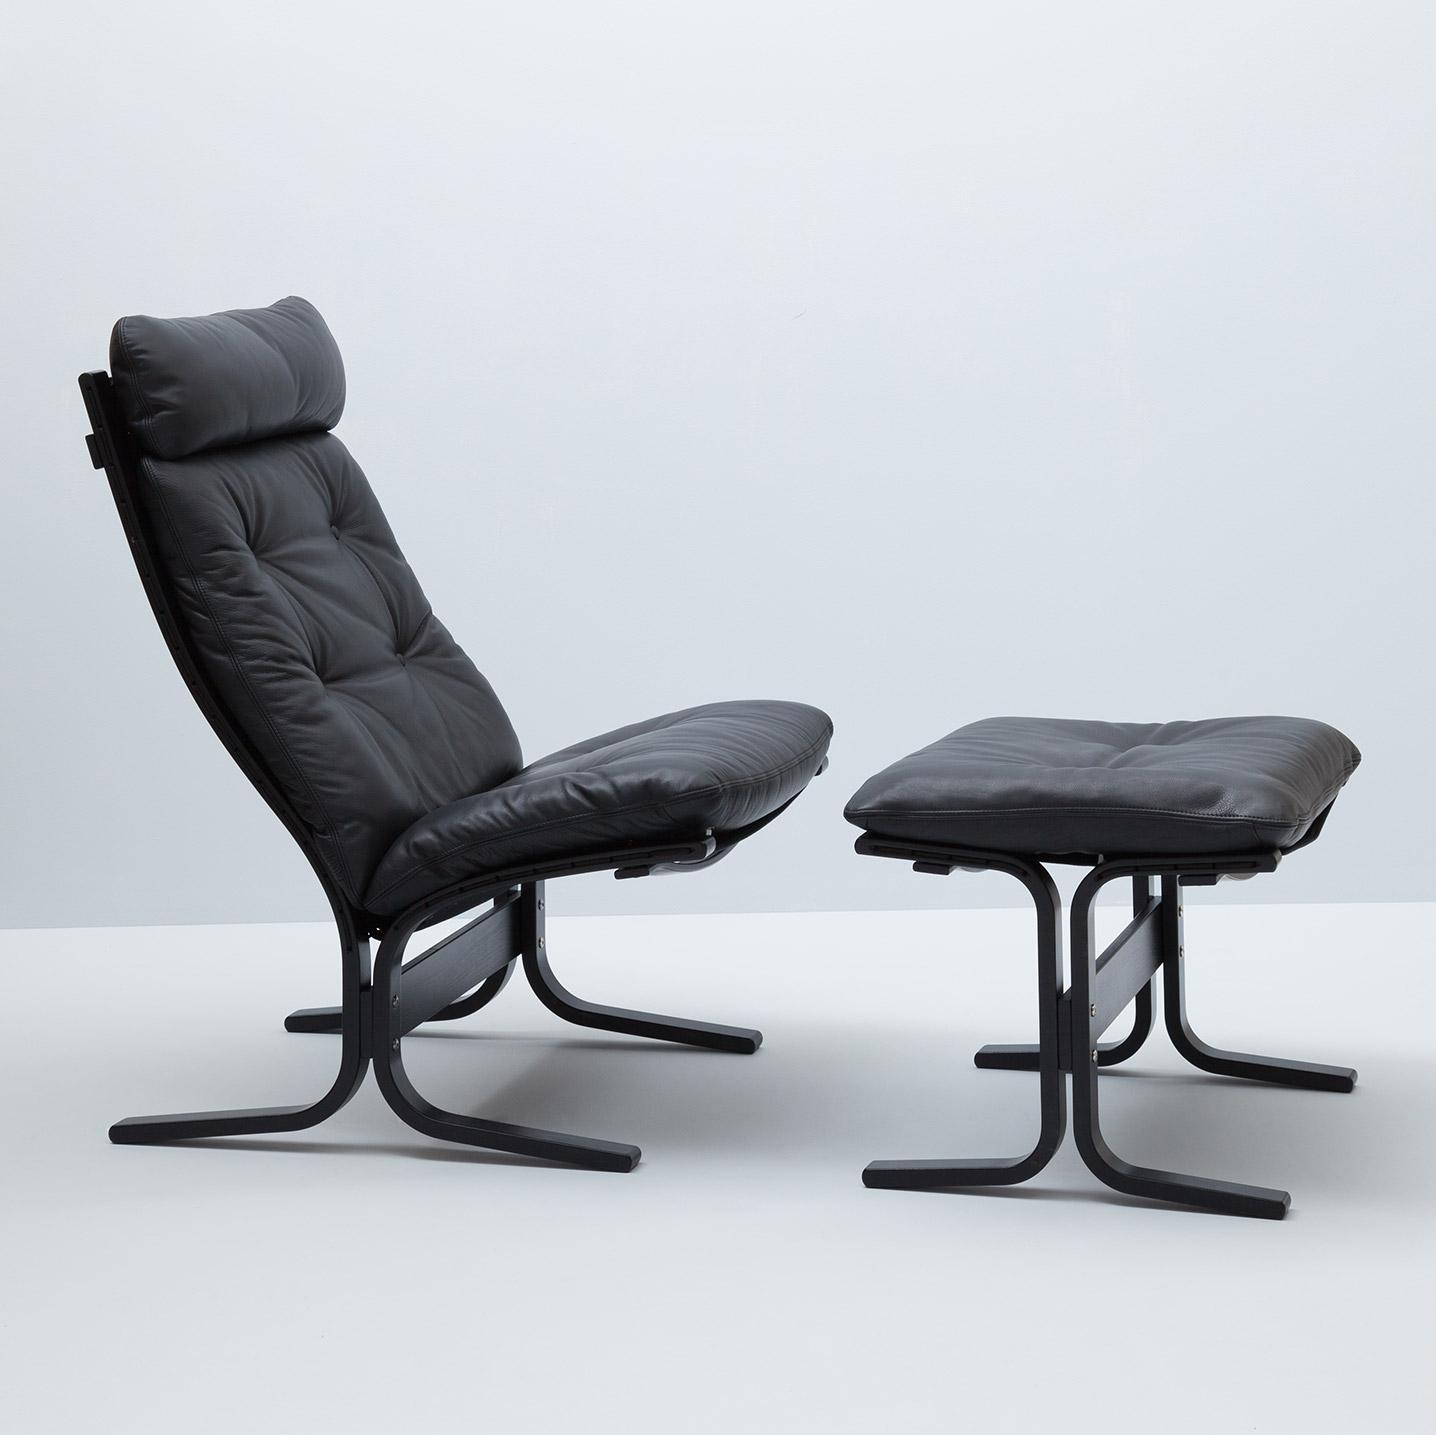 Siesta stol